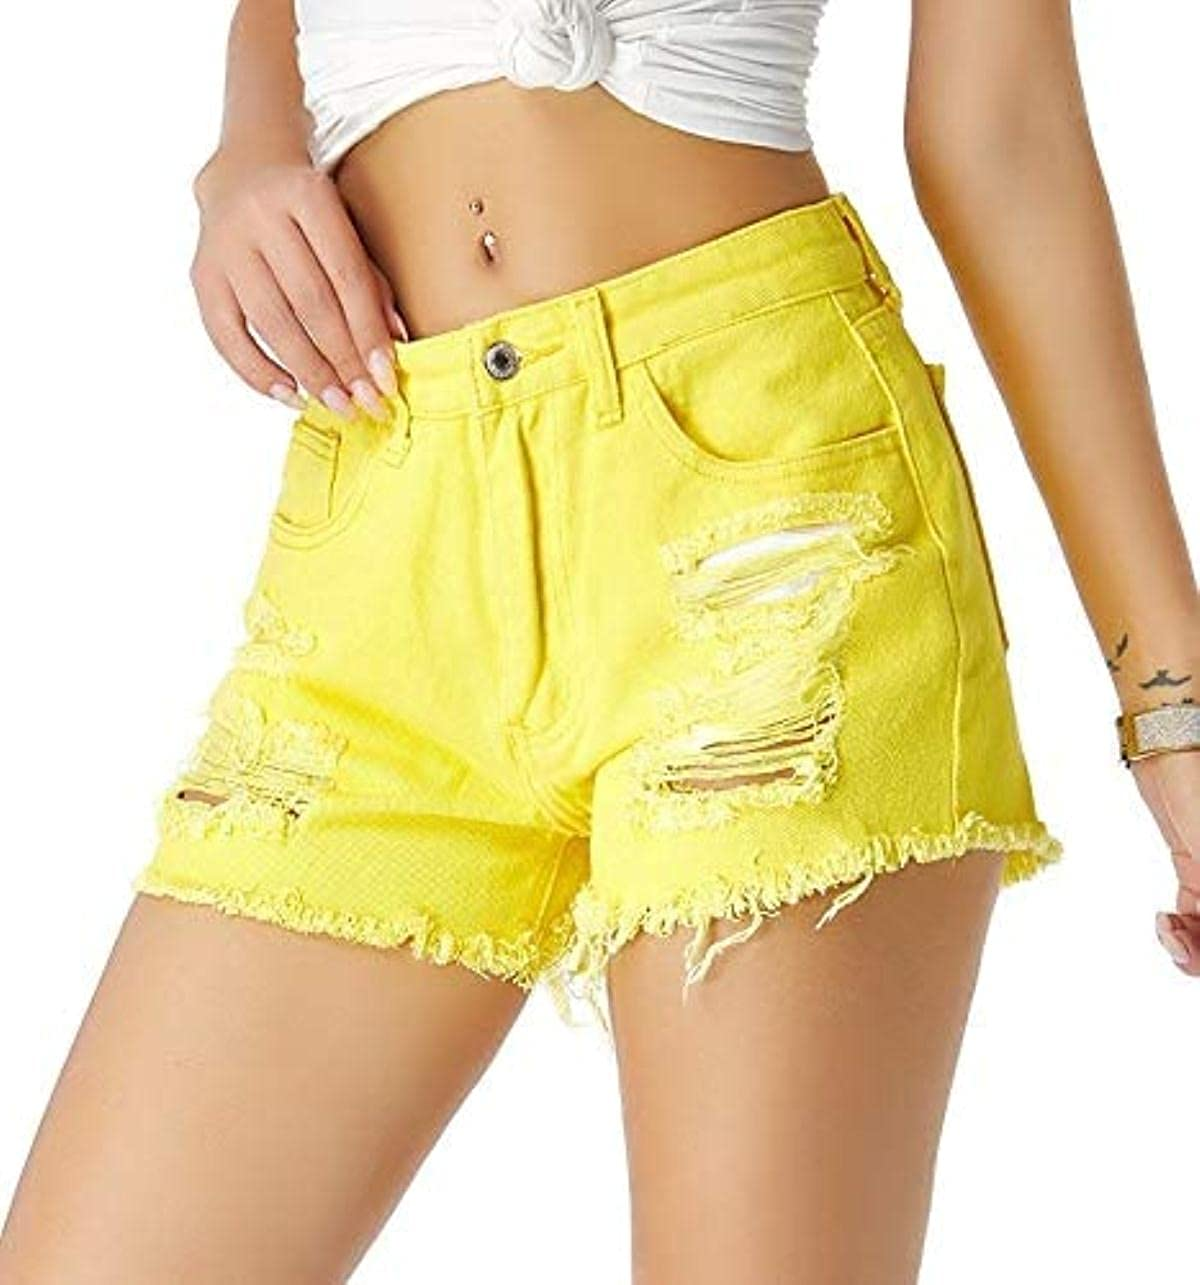 Rsqsjgkert Women's Mid Waist Distressed Ripped Denim Jeans Hot Shorts